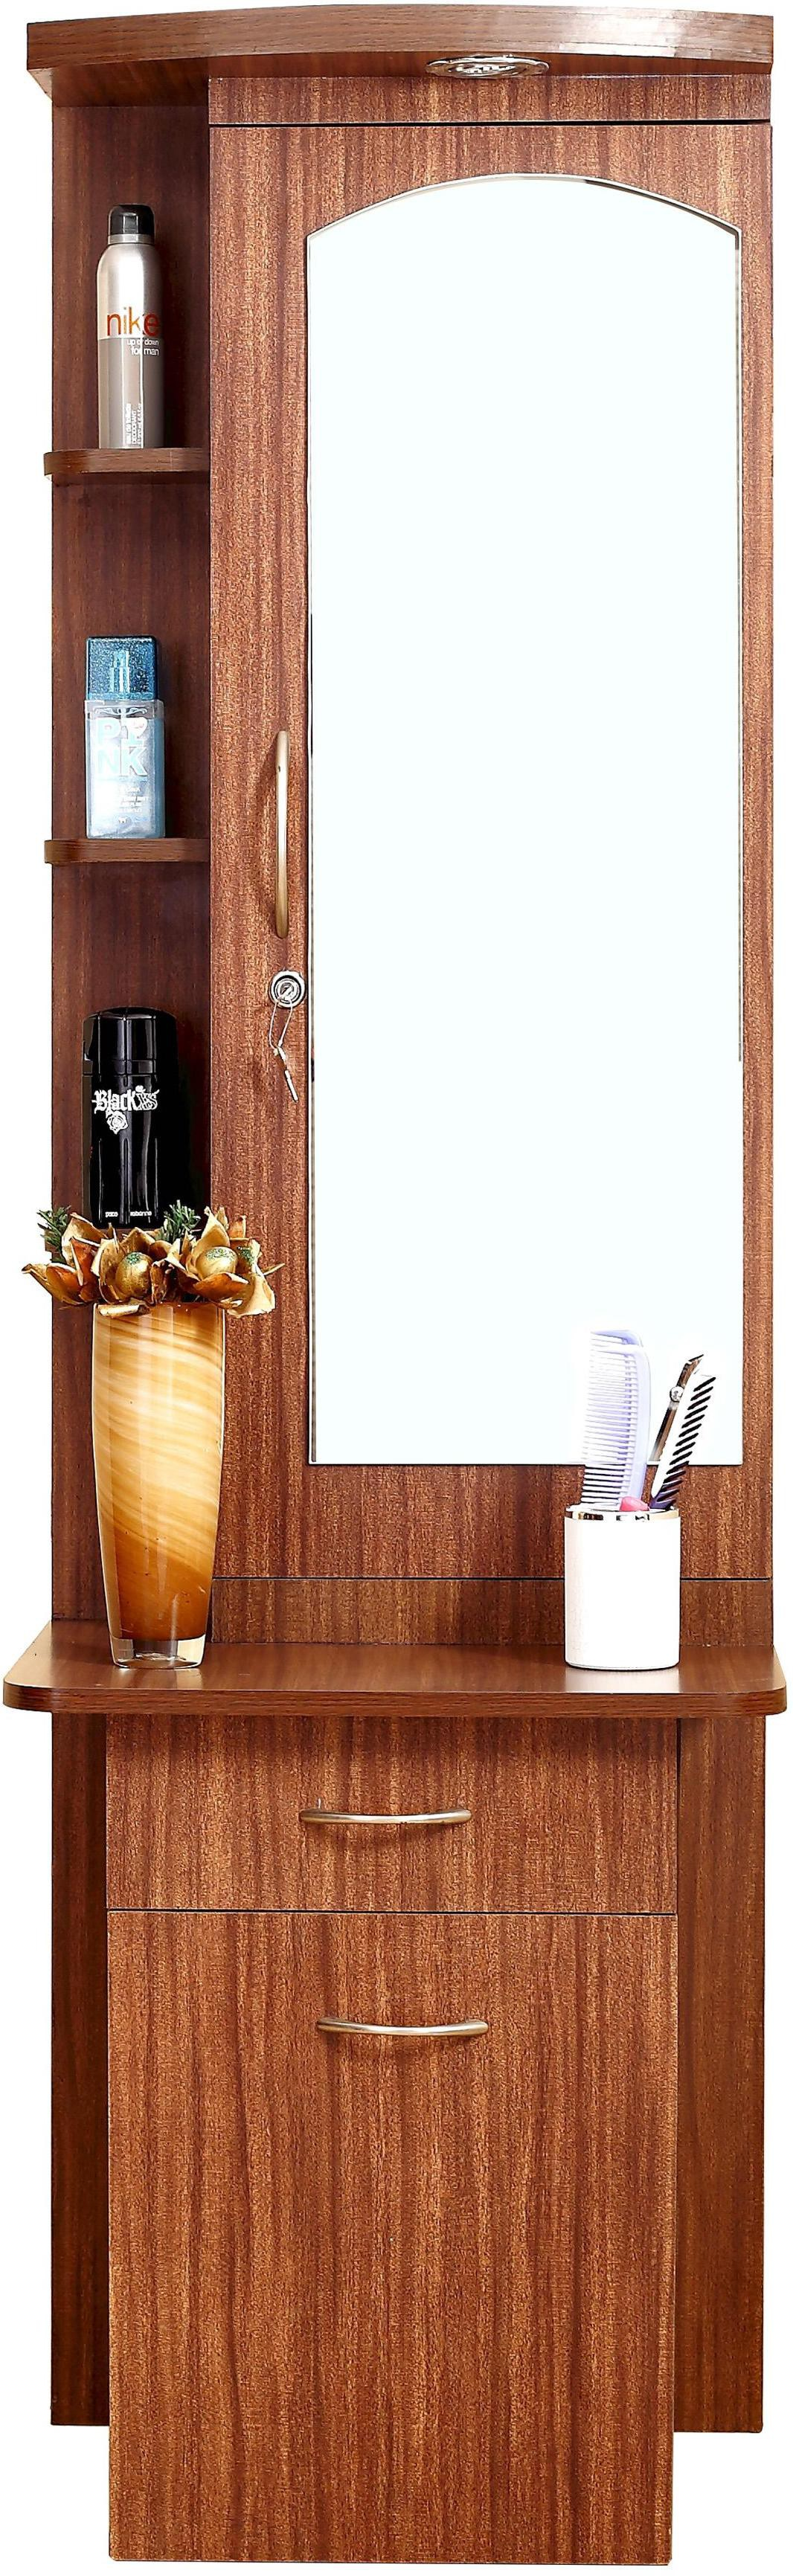 Furnicity Engineered Wood Dressing Tablefinish Color Tan